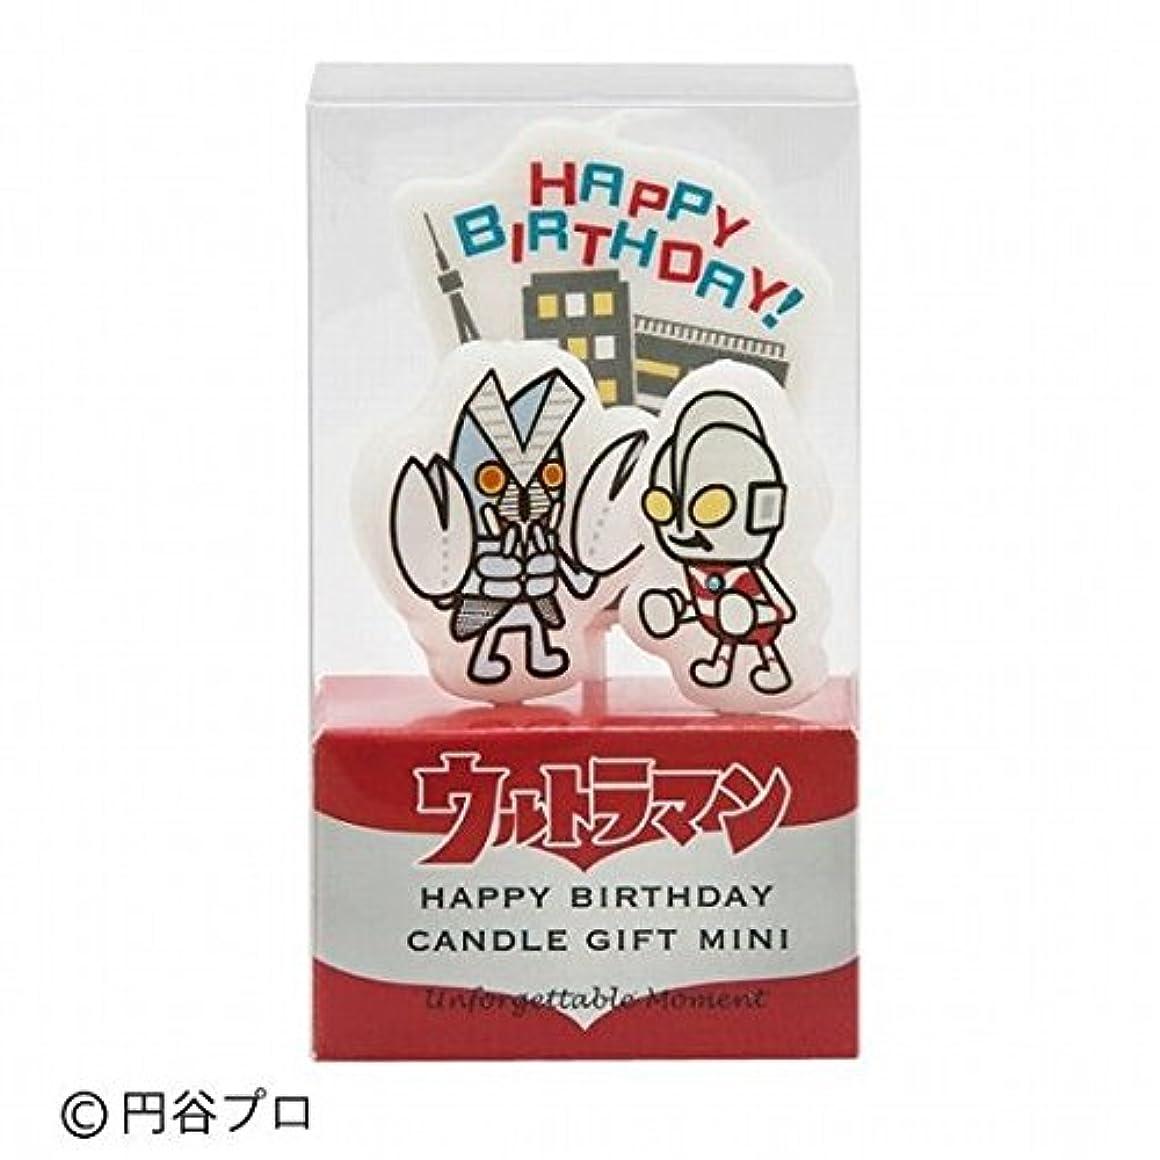 kameyama candle(カメヤマキャンドル) ウルトラマンキャンドルギフトミニ 「 ハッピーバースデー 」(55360060)